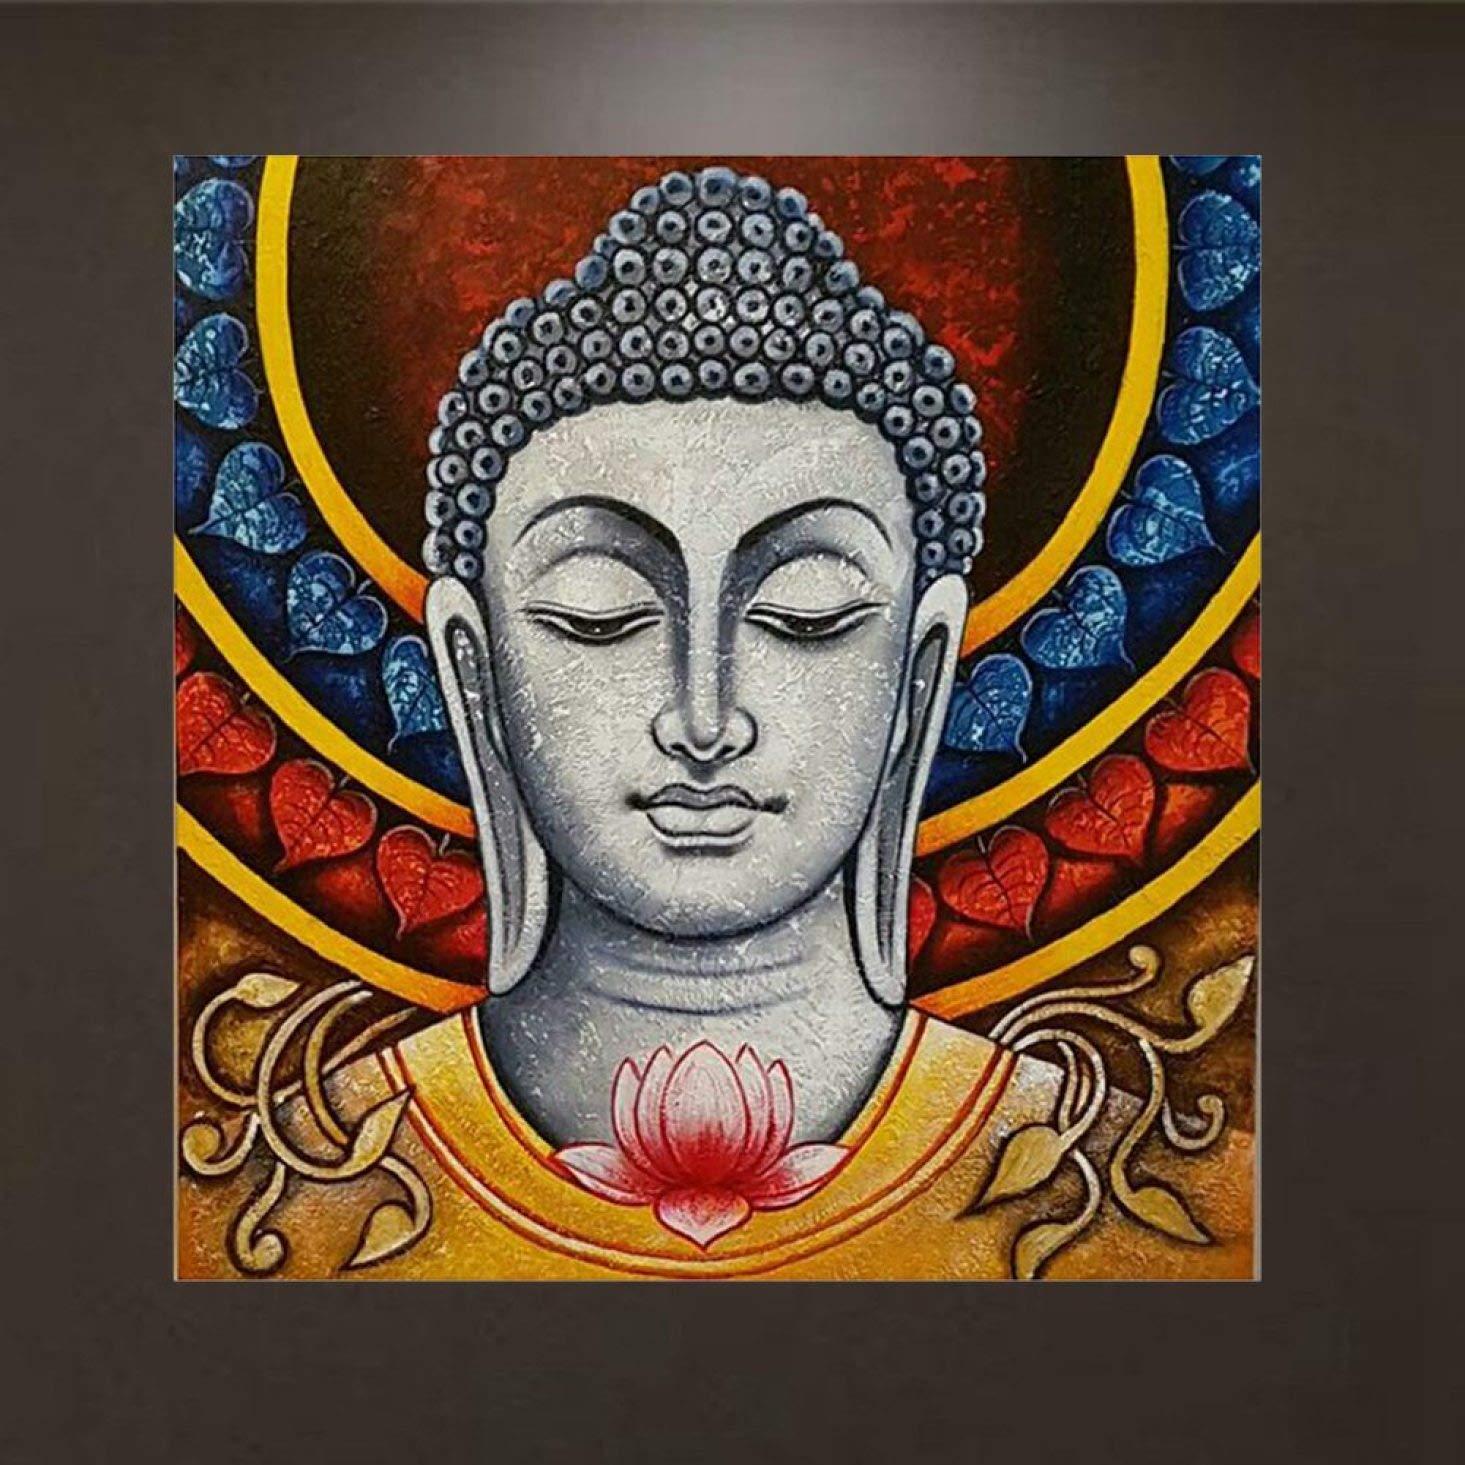 QTBWen fine craftsmanship Diamond Embroidery Buddha Religous Diamond Painting Cross Stitch Mosaic Pattern Full Rhinestone Home Decor for Home Decoration None k411